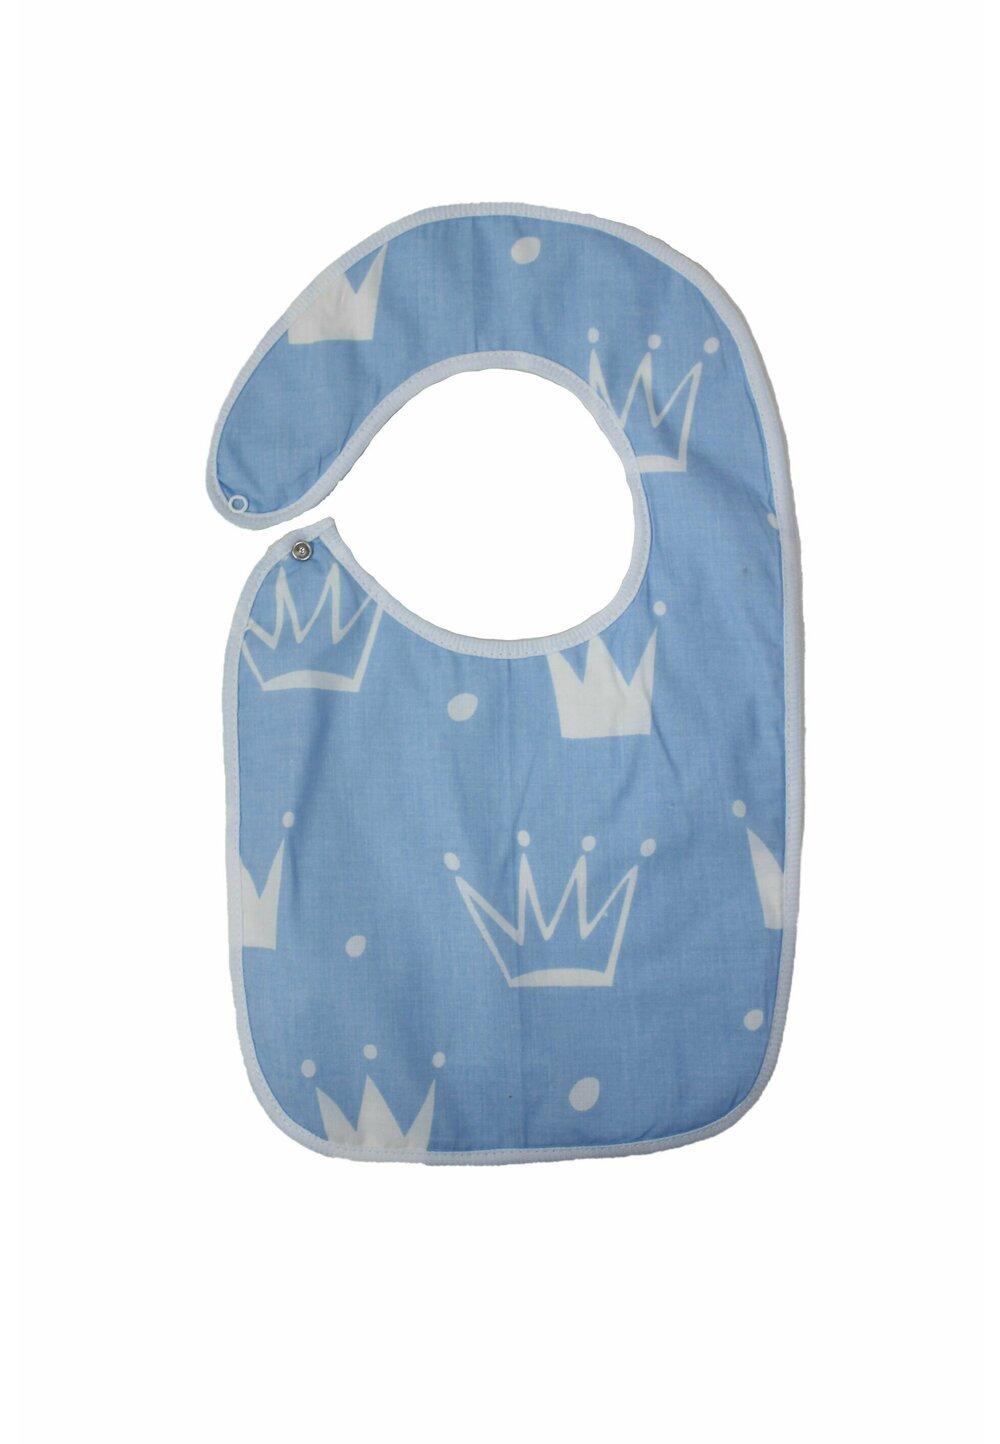 Baveta bebe, coronite albastre, 0-6 luni imagine